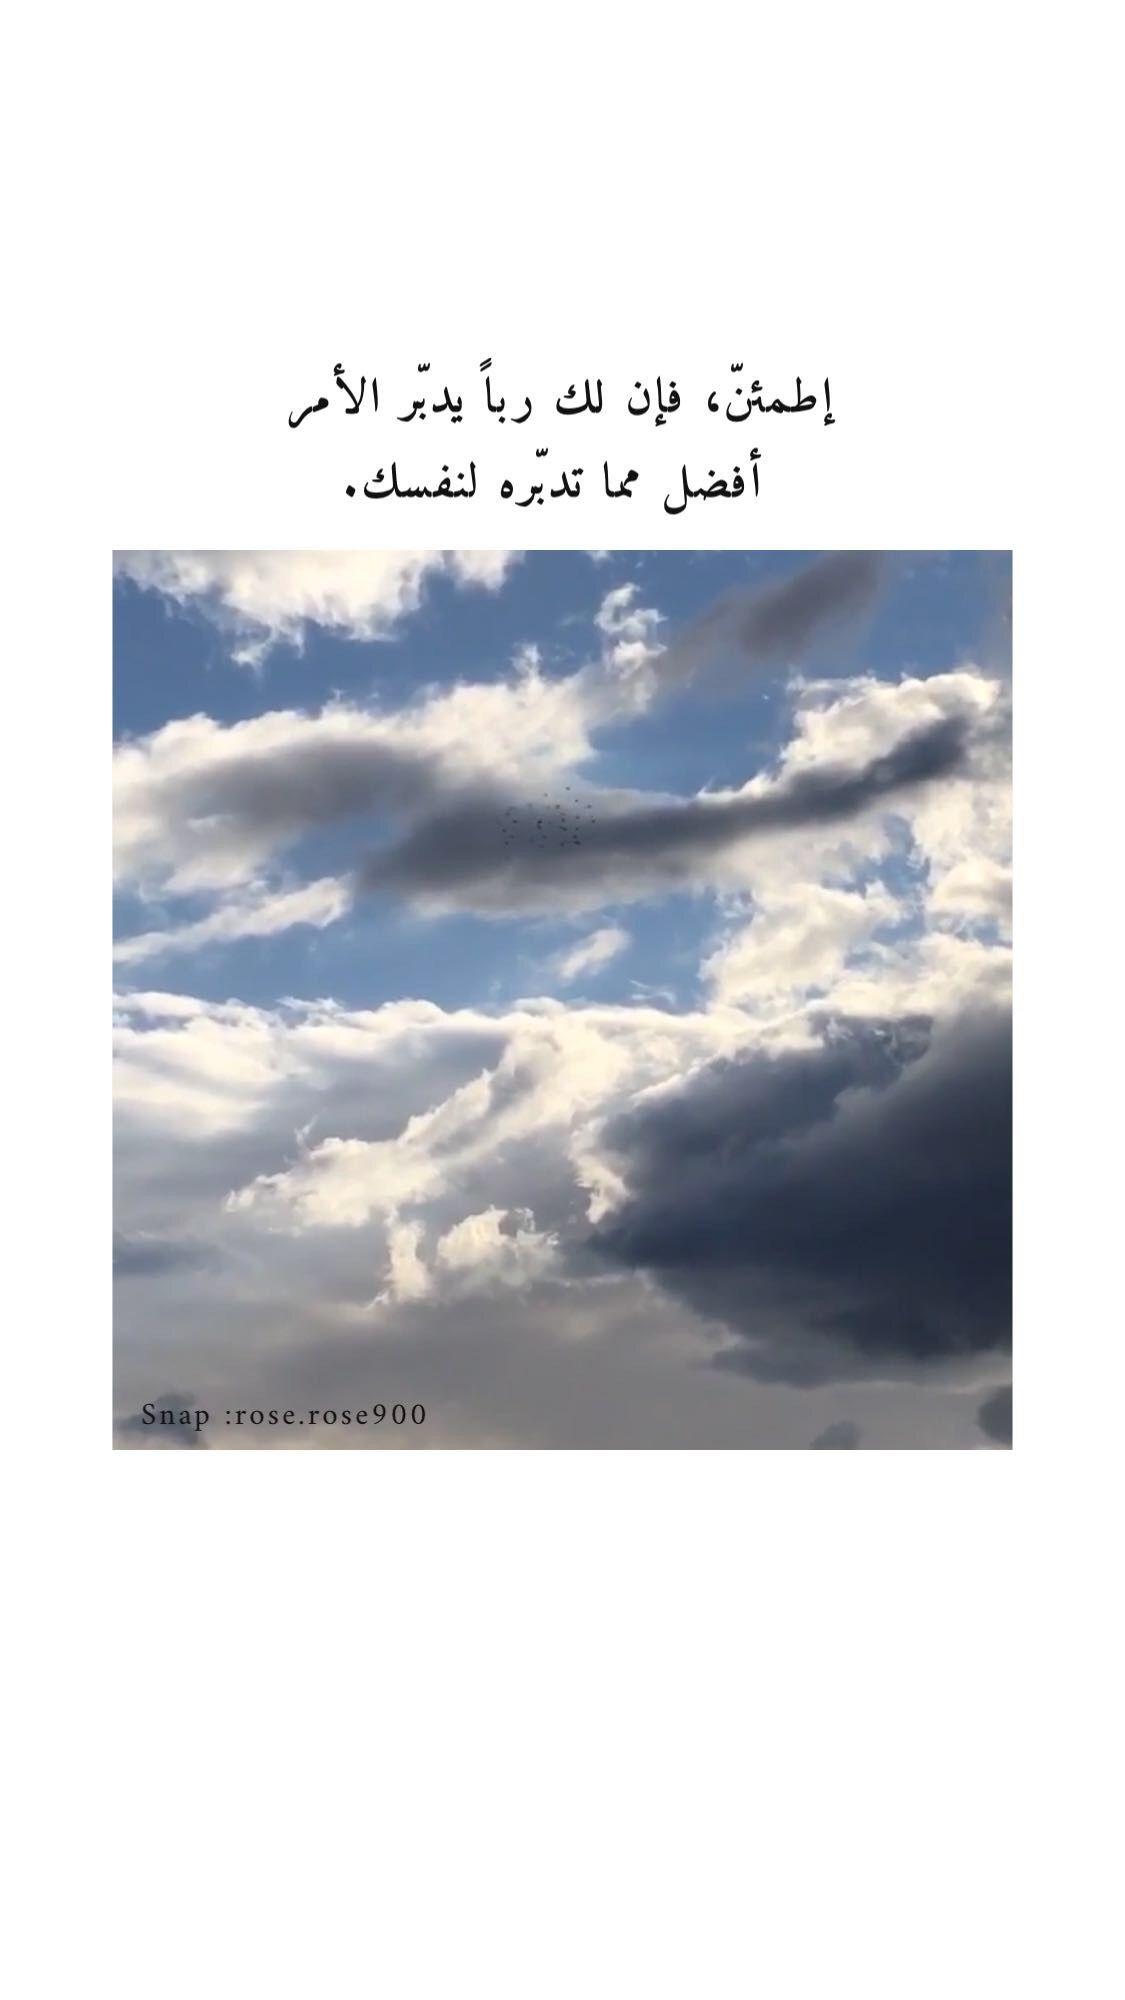 Pin By 김 널한 On للكلمة روح Arabic Quotes Islamic Quotes Quran Ramadan Quotes